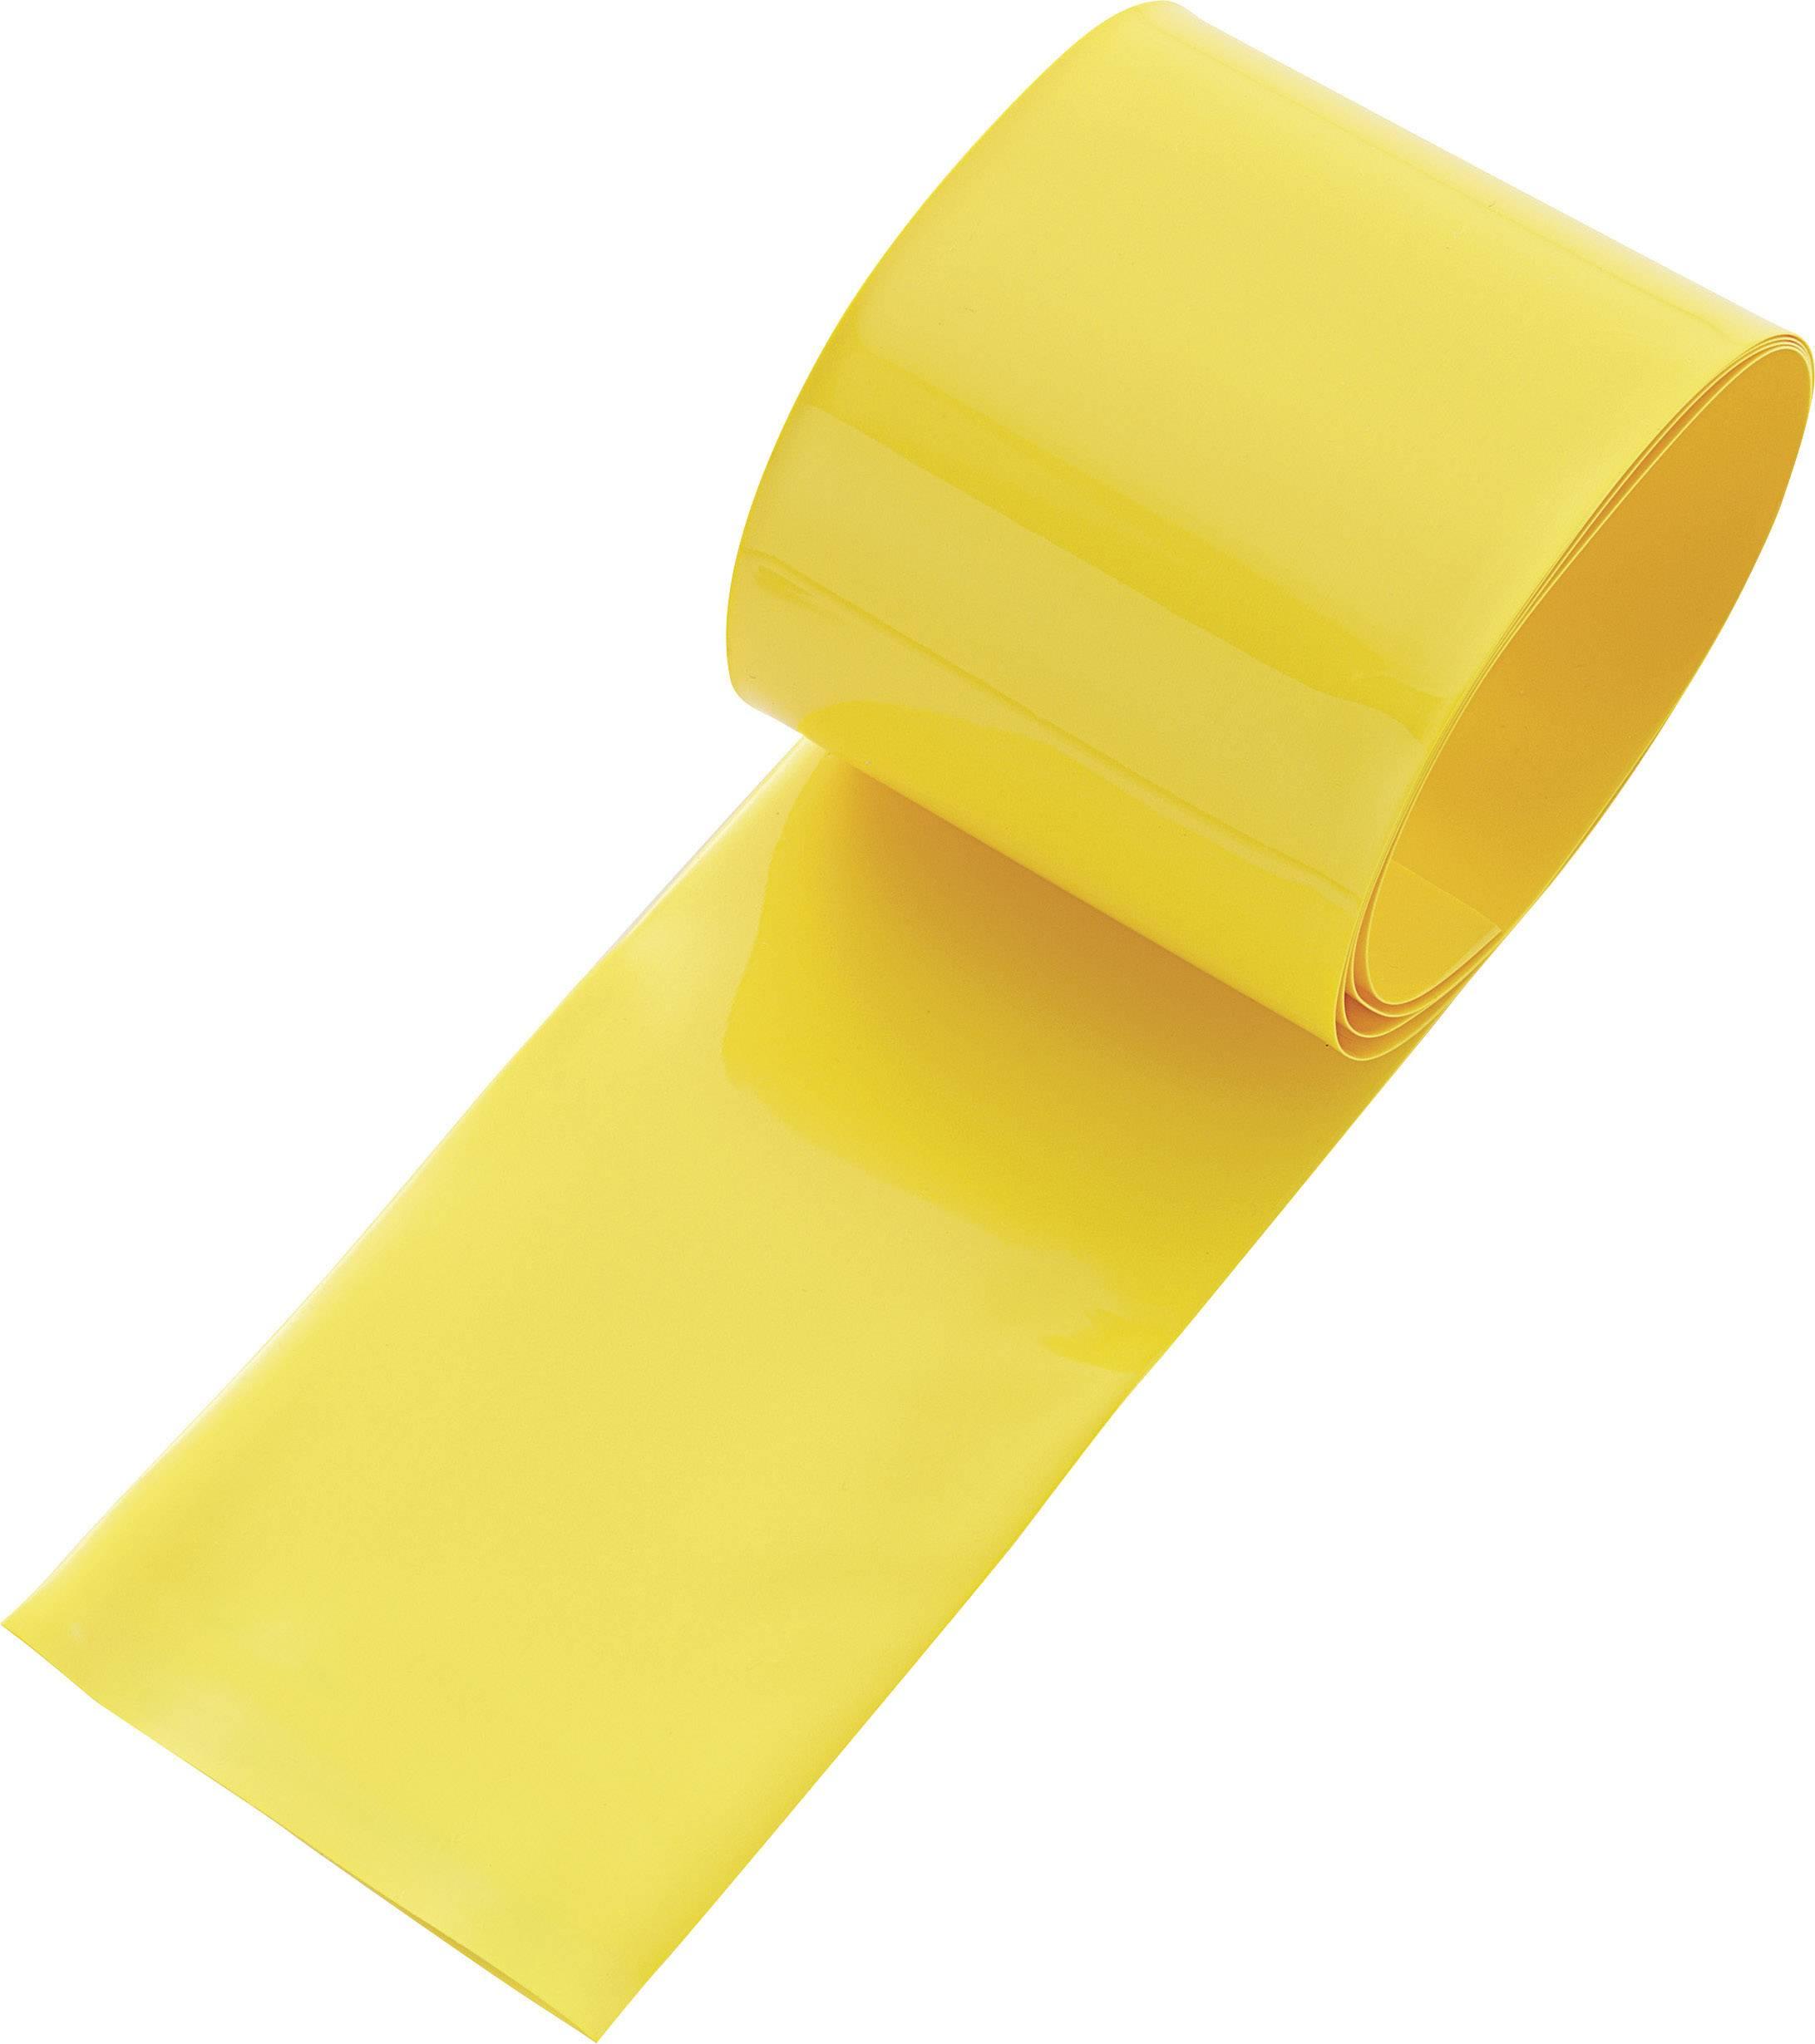 Smršťovací bužírka na akumulátory, bez lepidla TRU COMPONENTS 93014c85e, 130 mm, žlutá, 1 ks